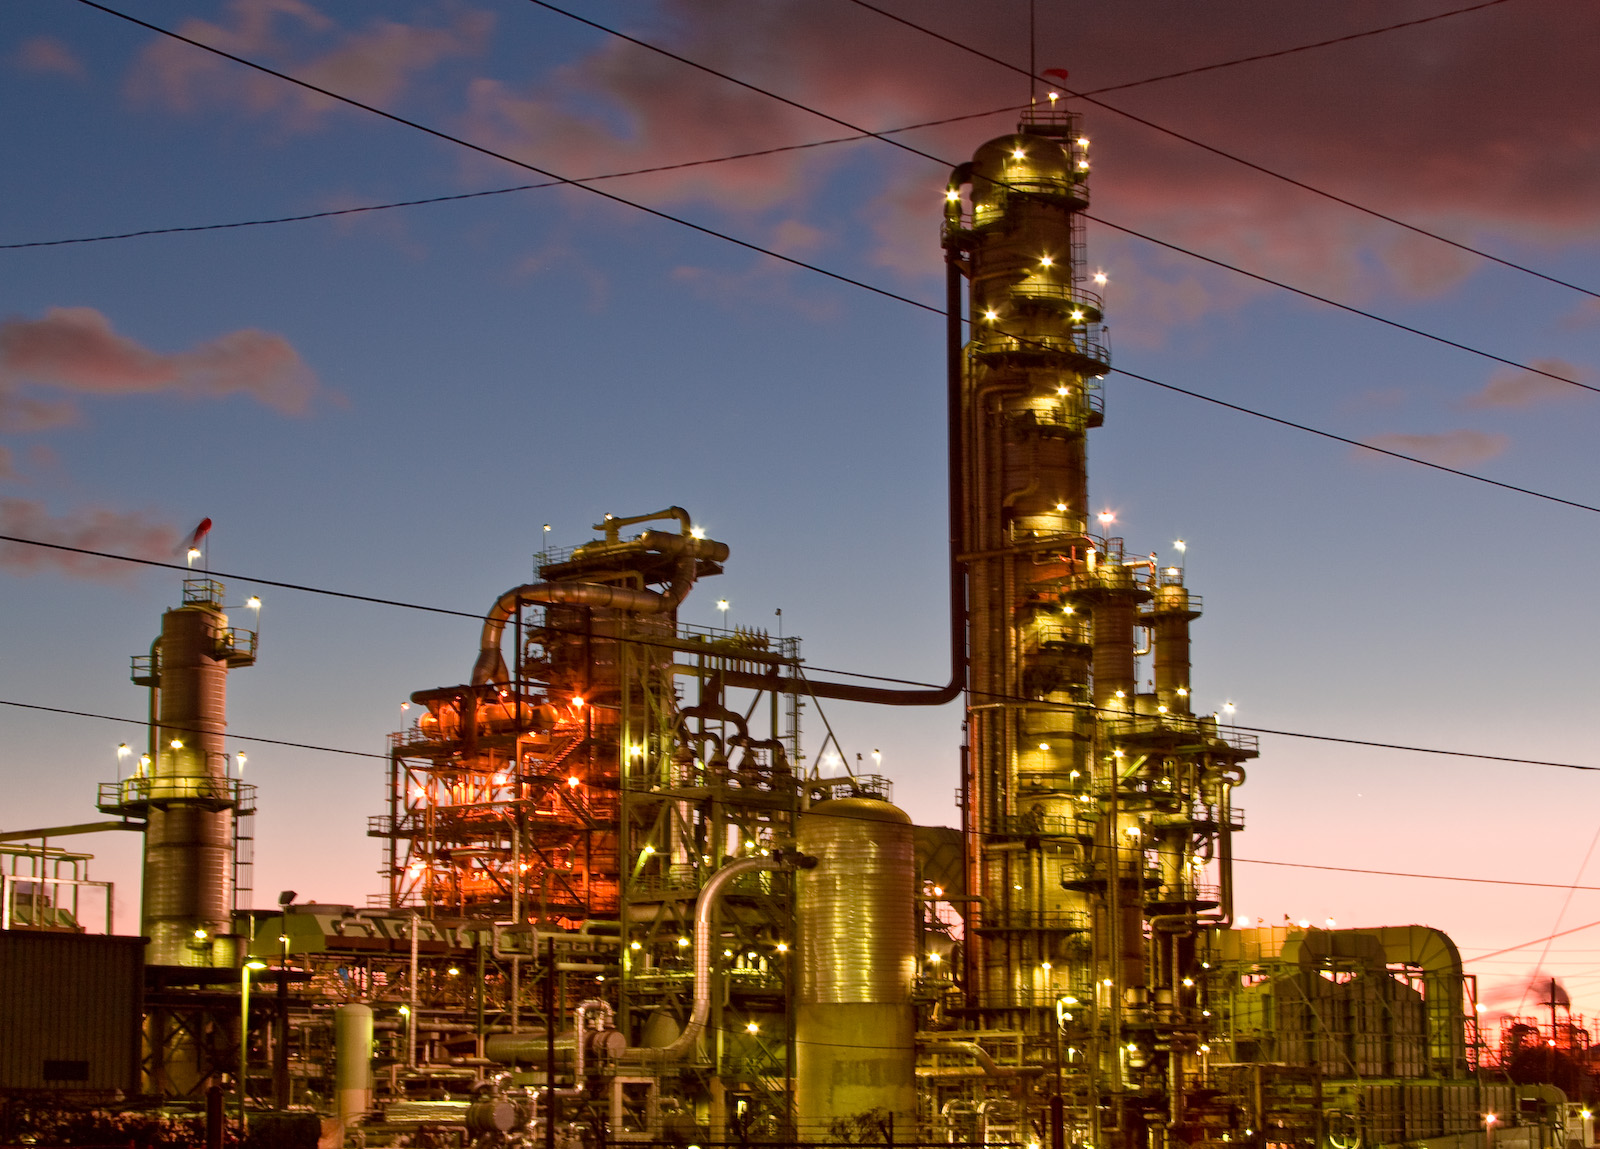 File:Chevron El Segundo refinery, 2007 jpg - Wikimedia Commons